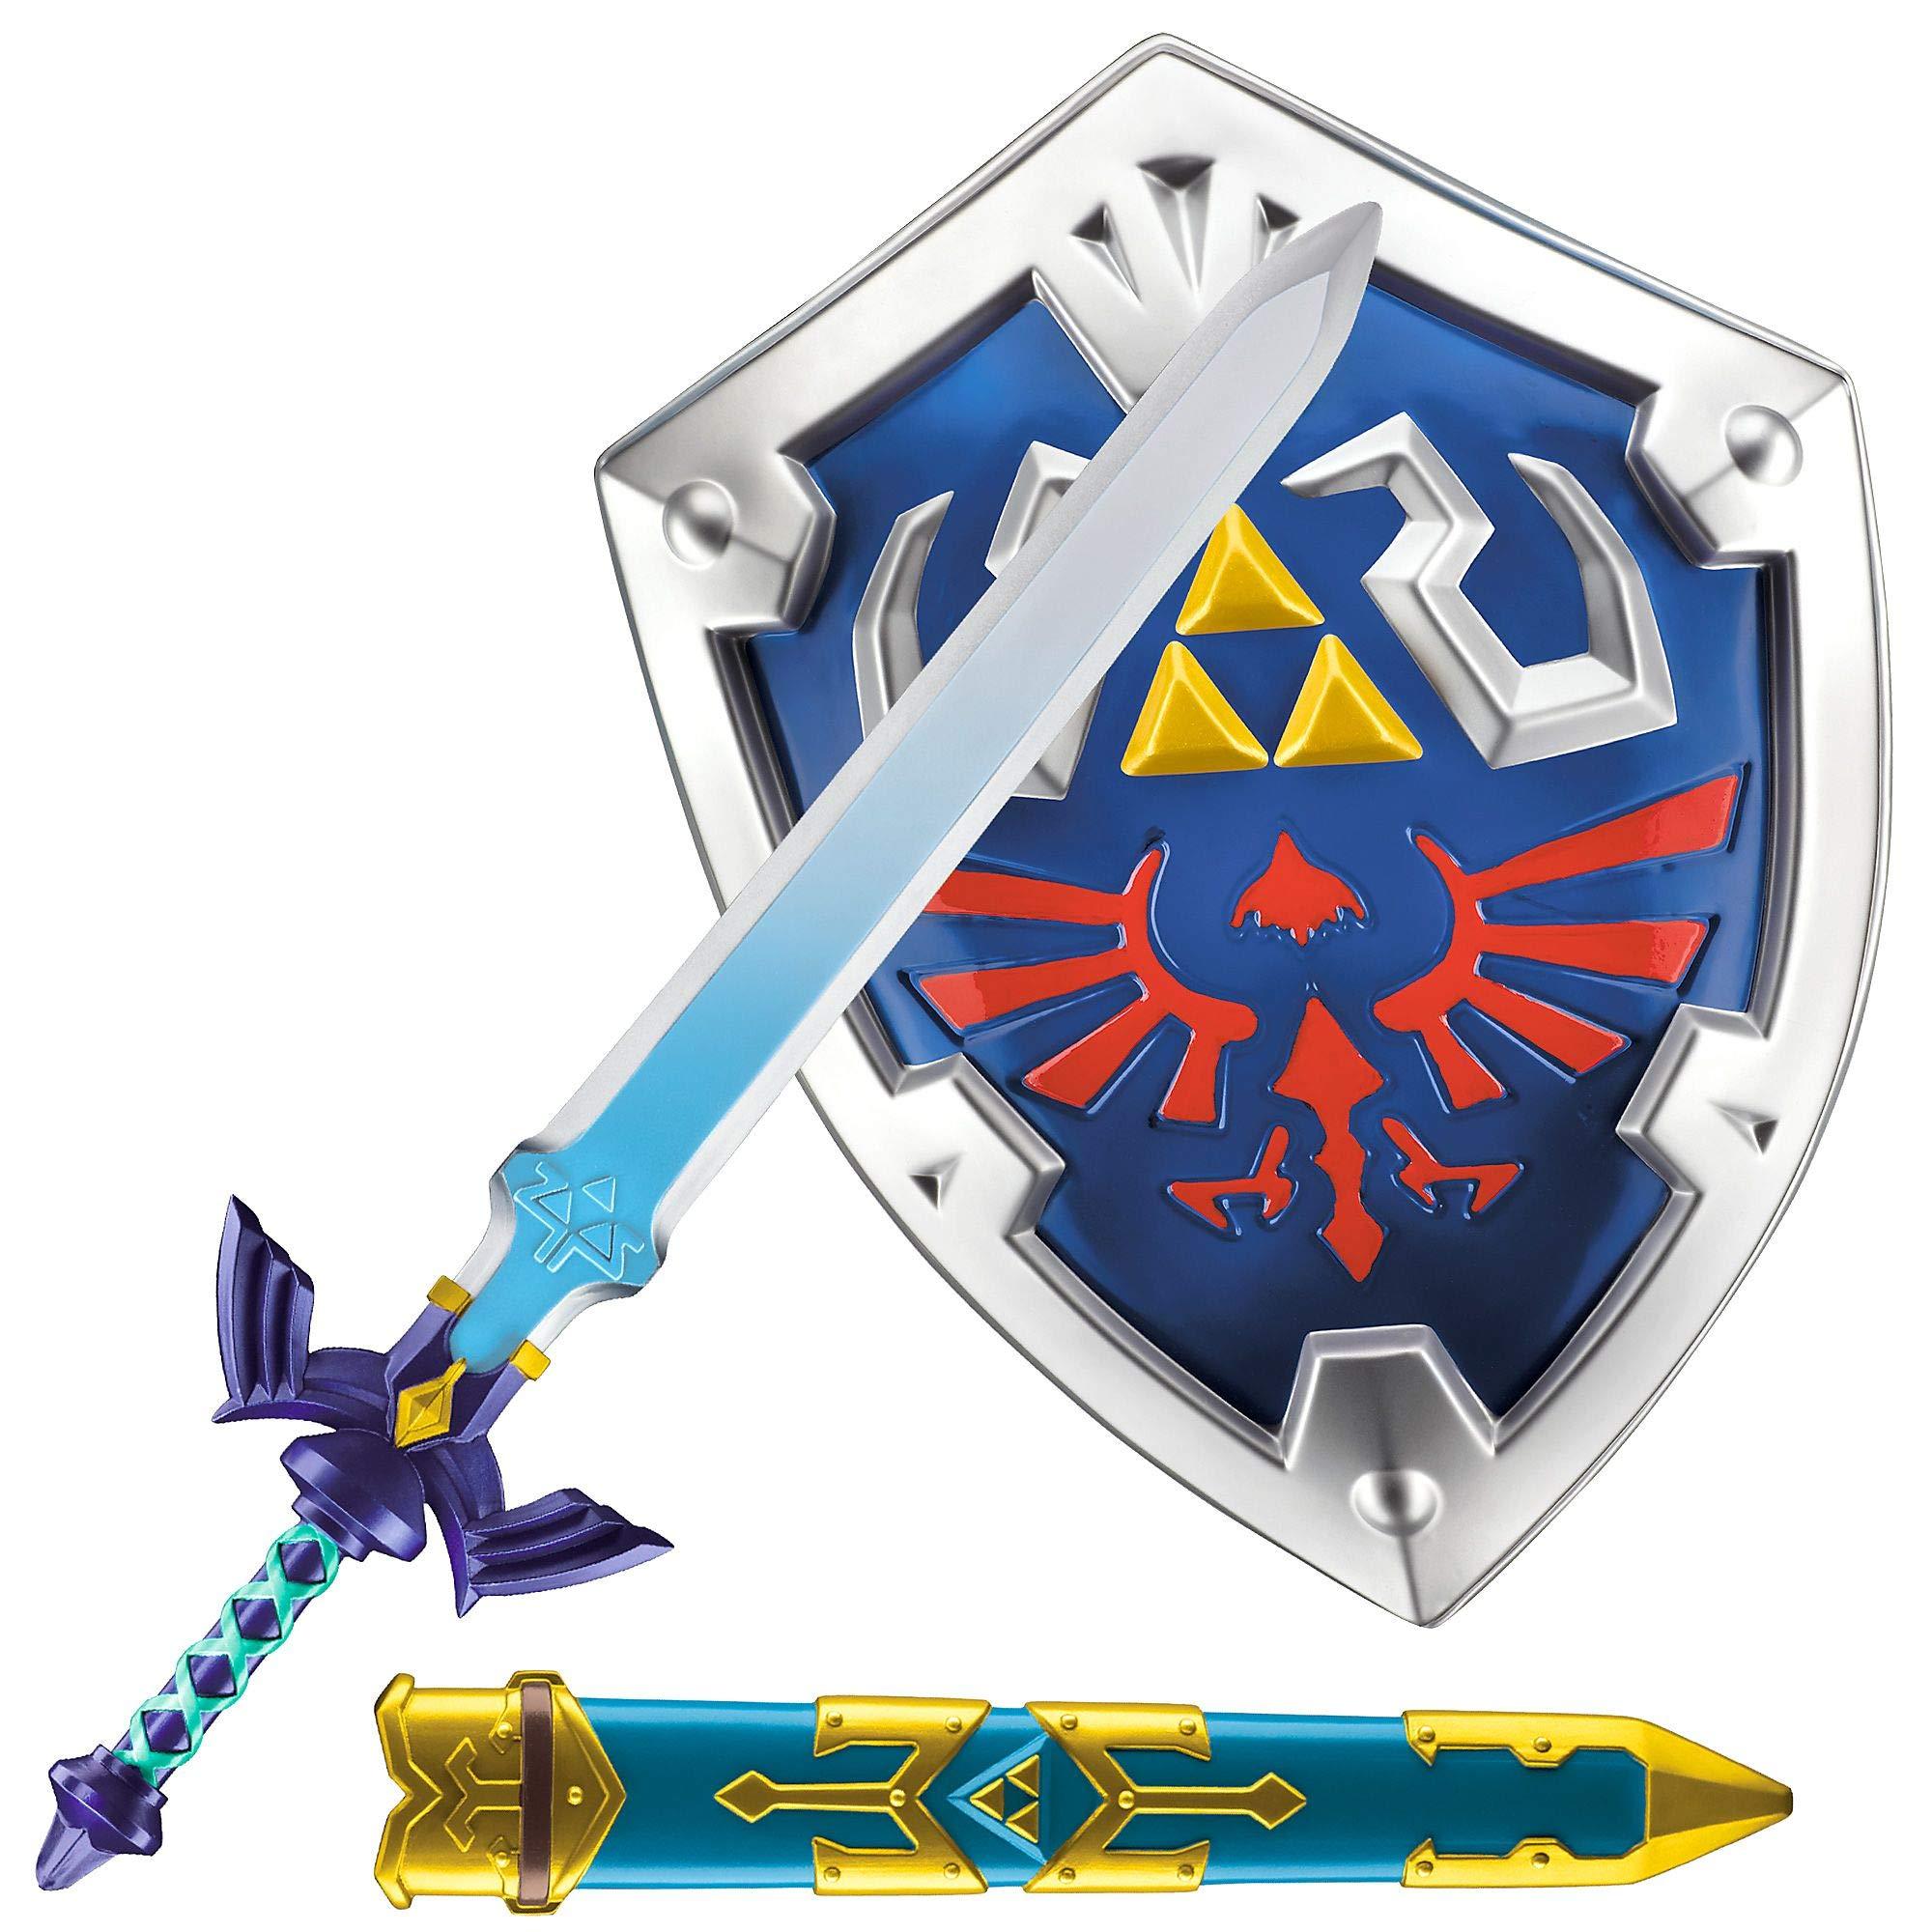 Party City The Legend of Zelda Sword & Shield Kit